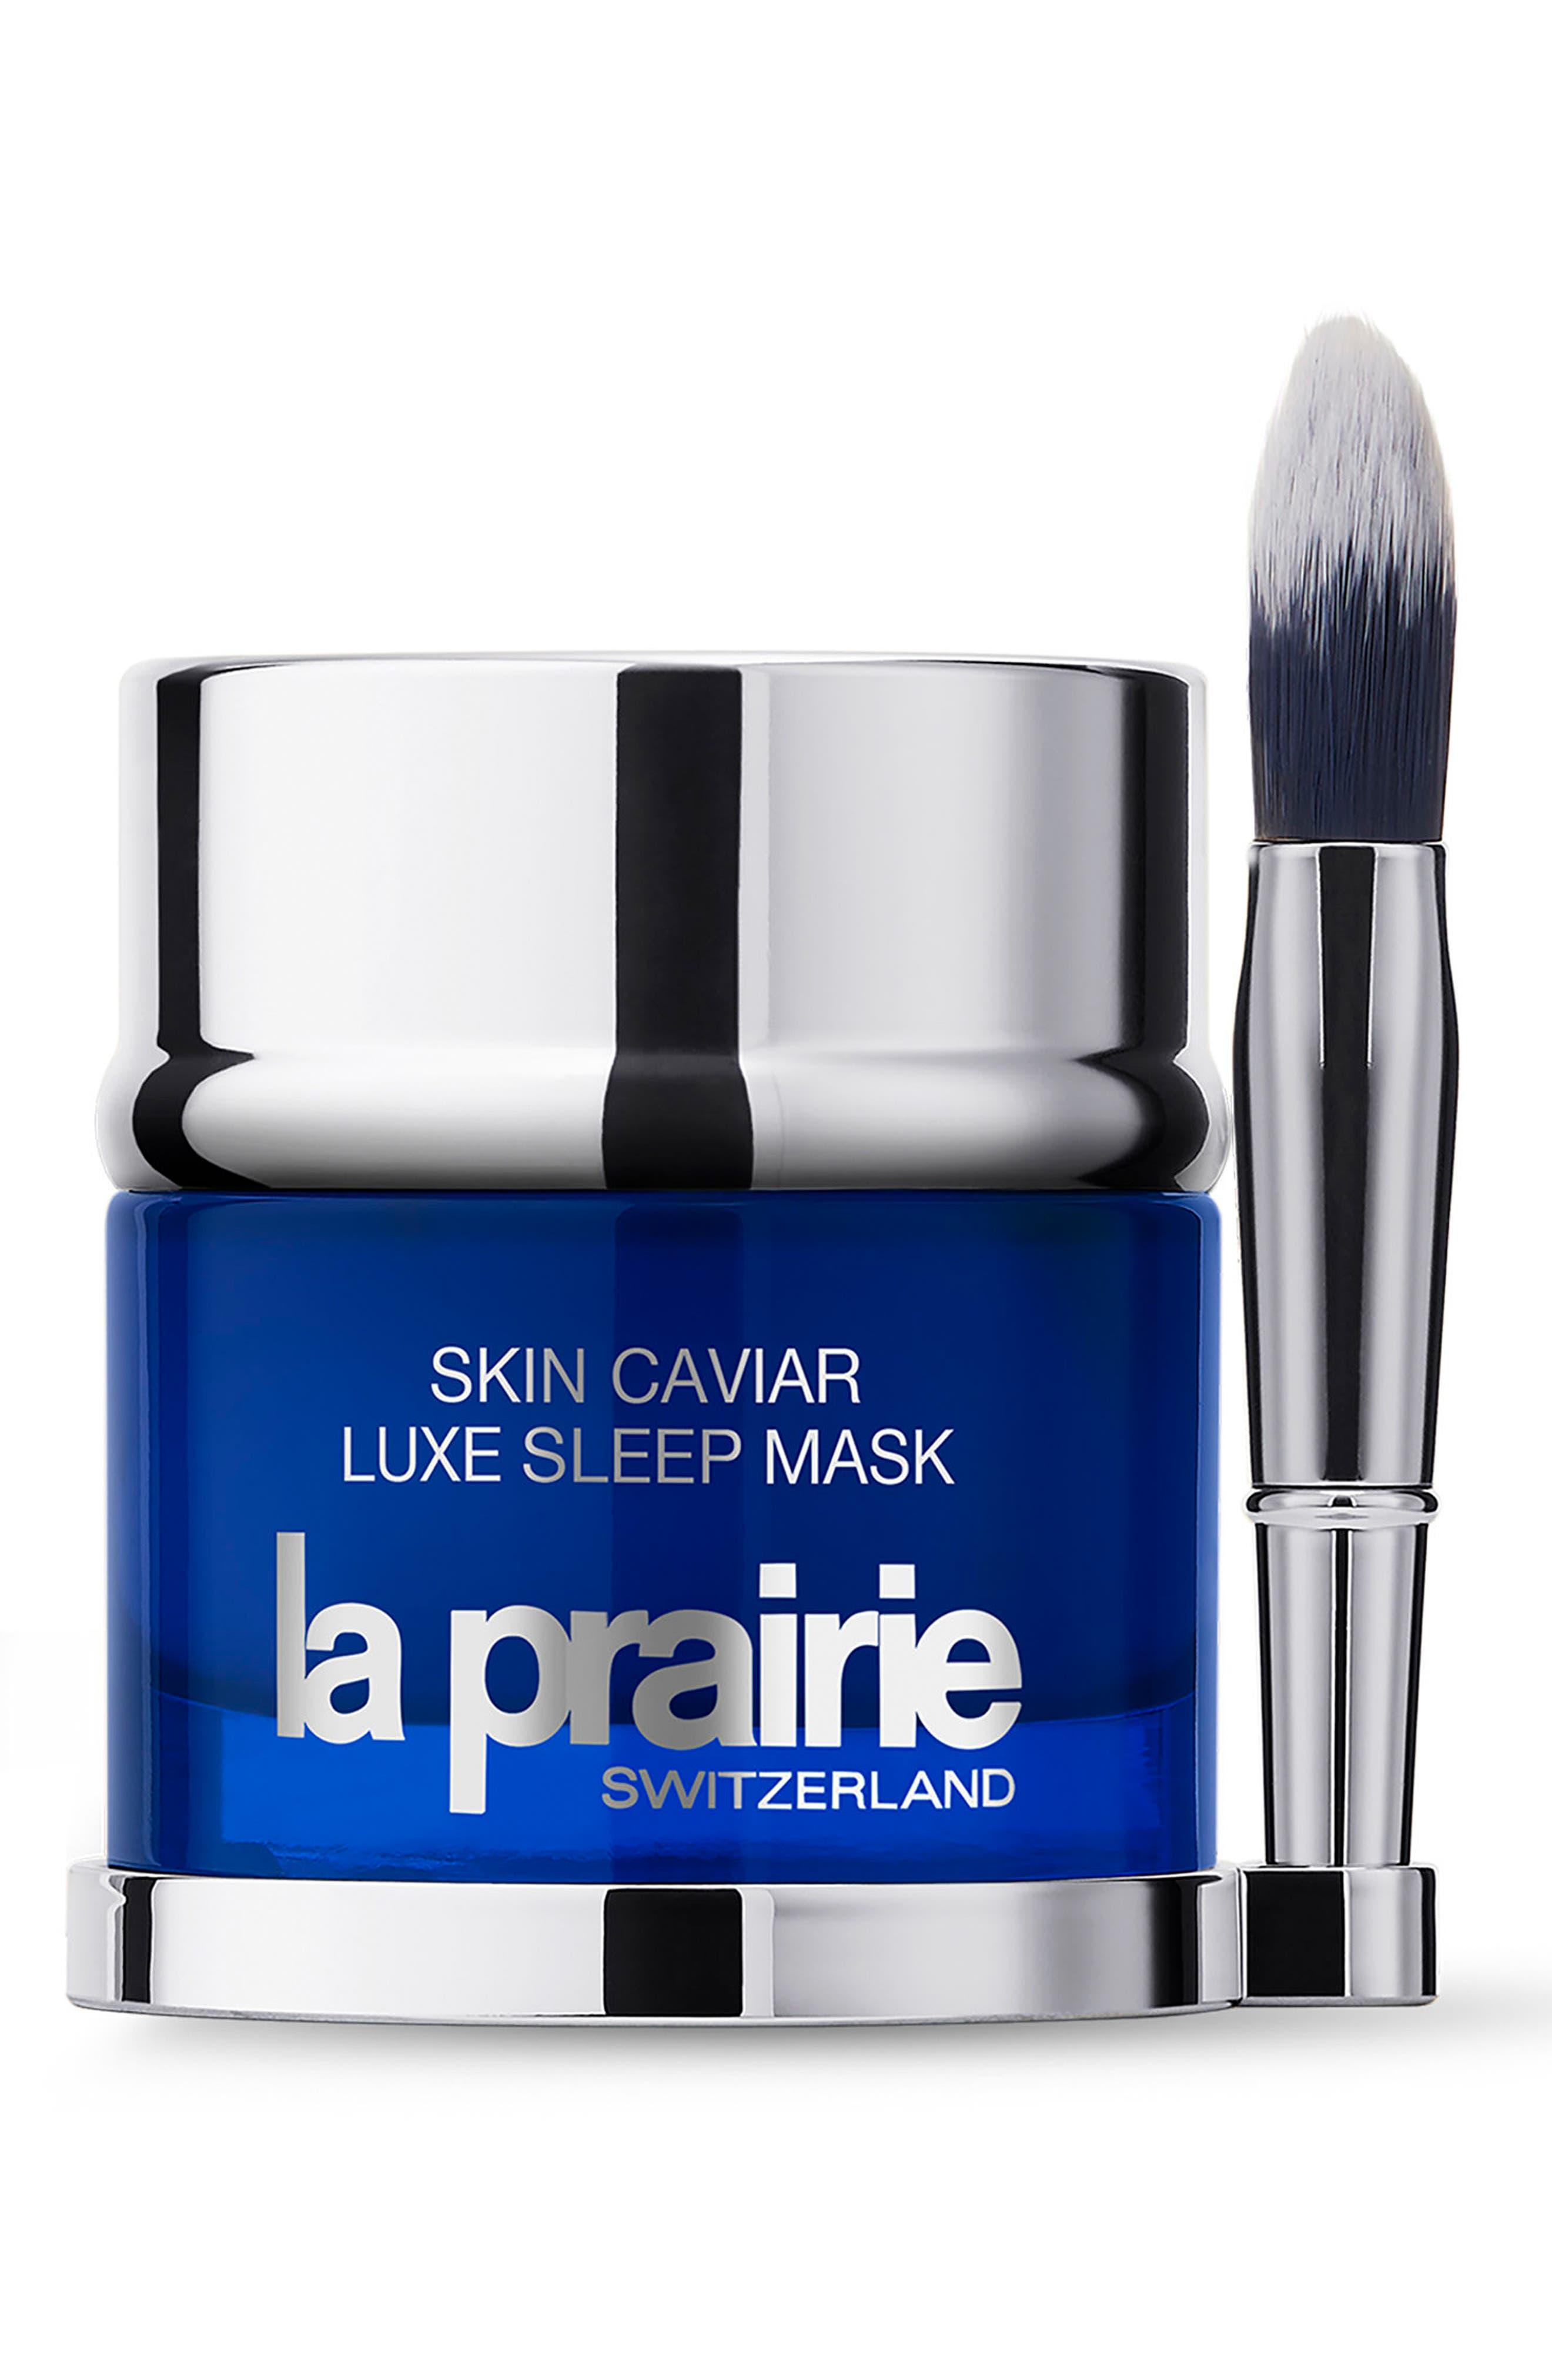 La Prairie 'Skin Caviar' Luxe Sleep Mask